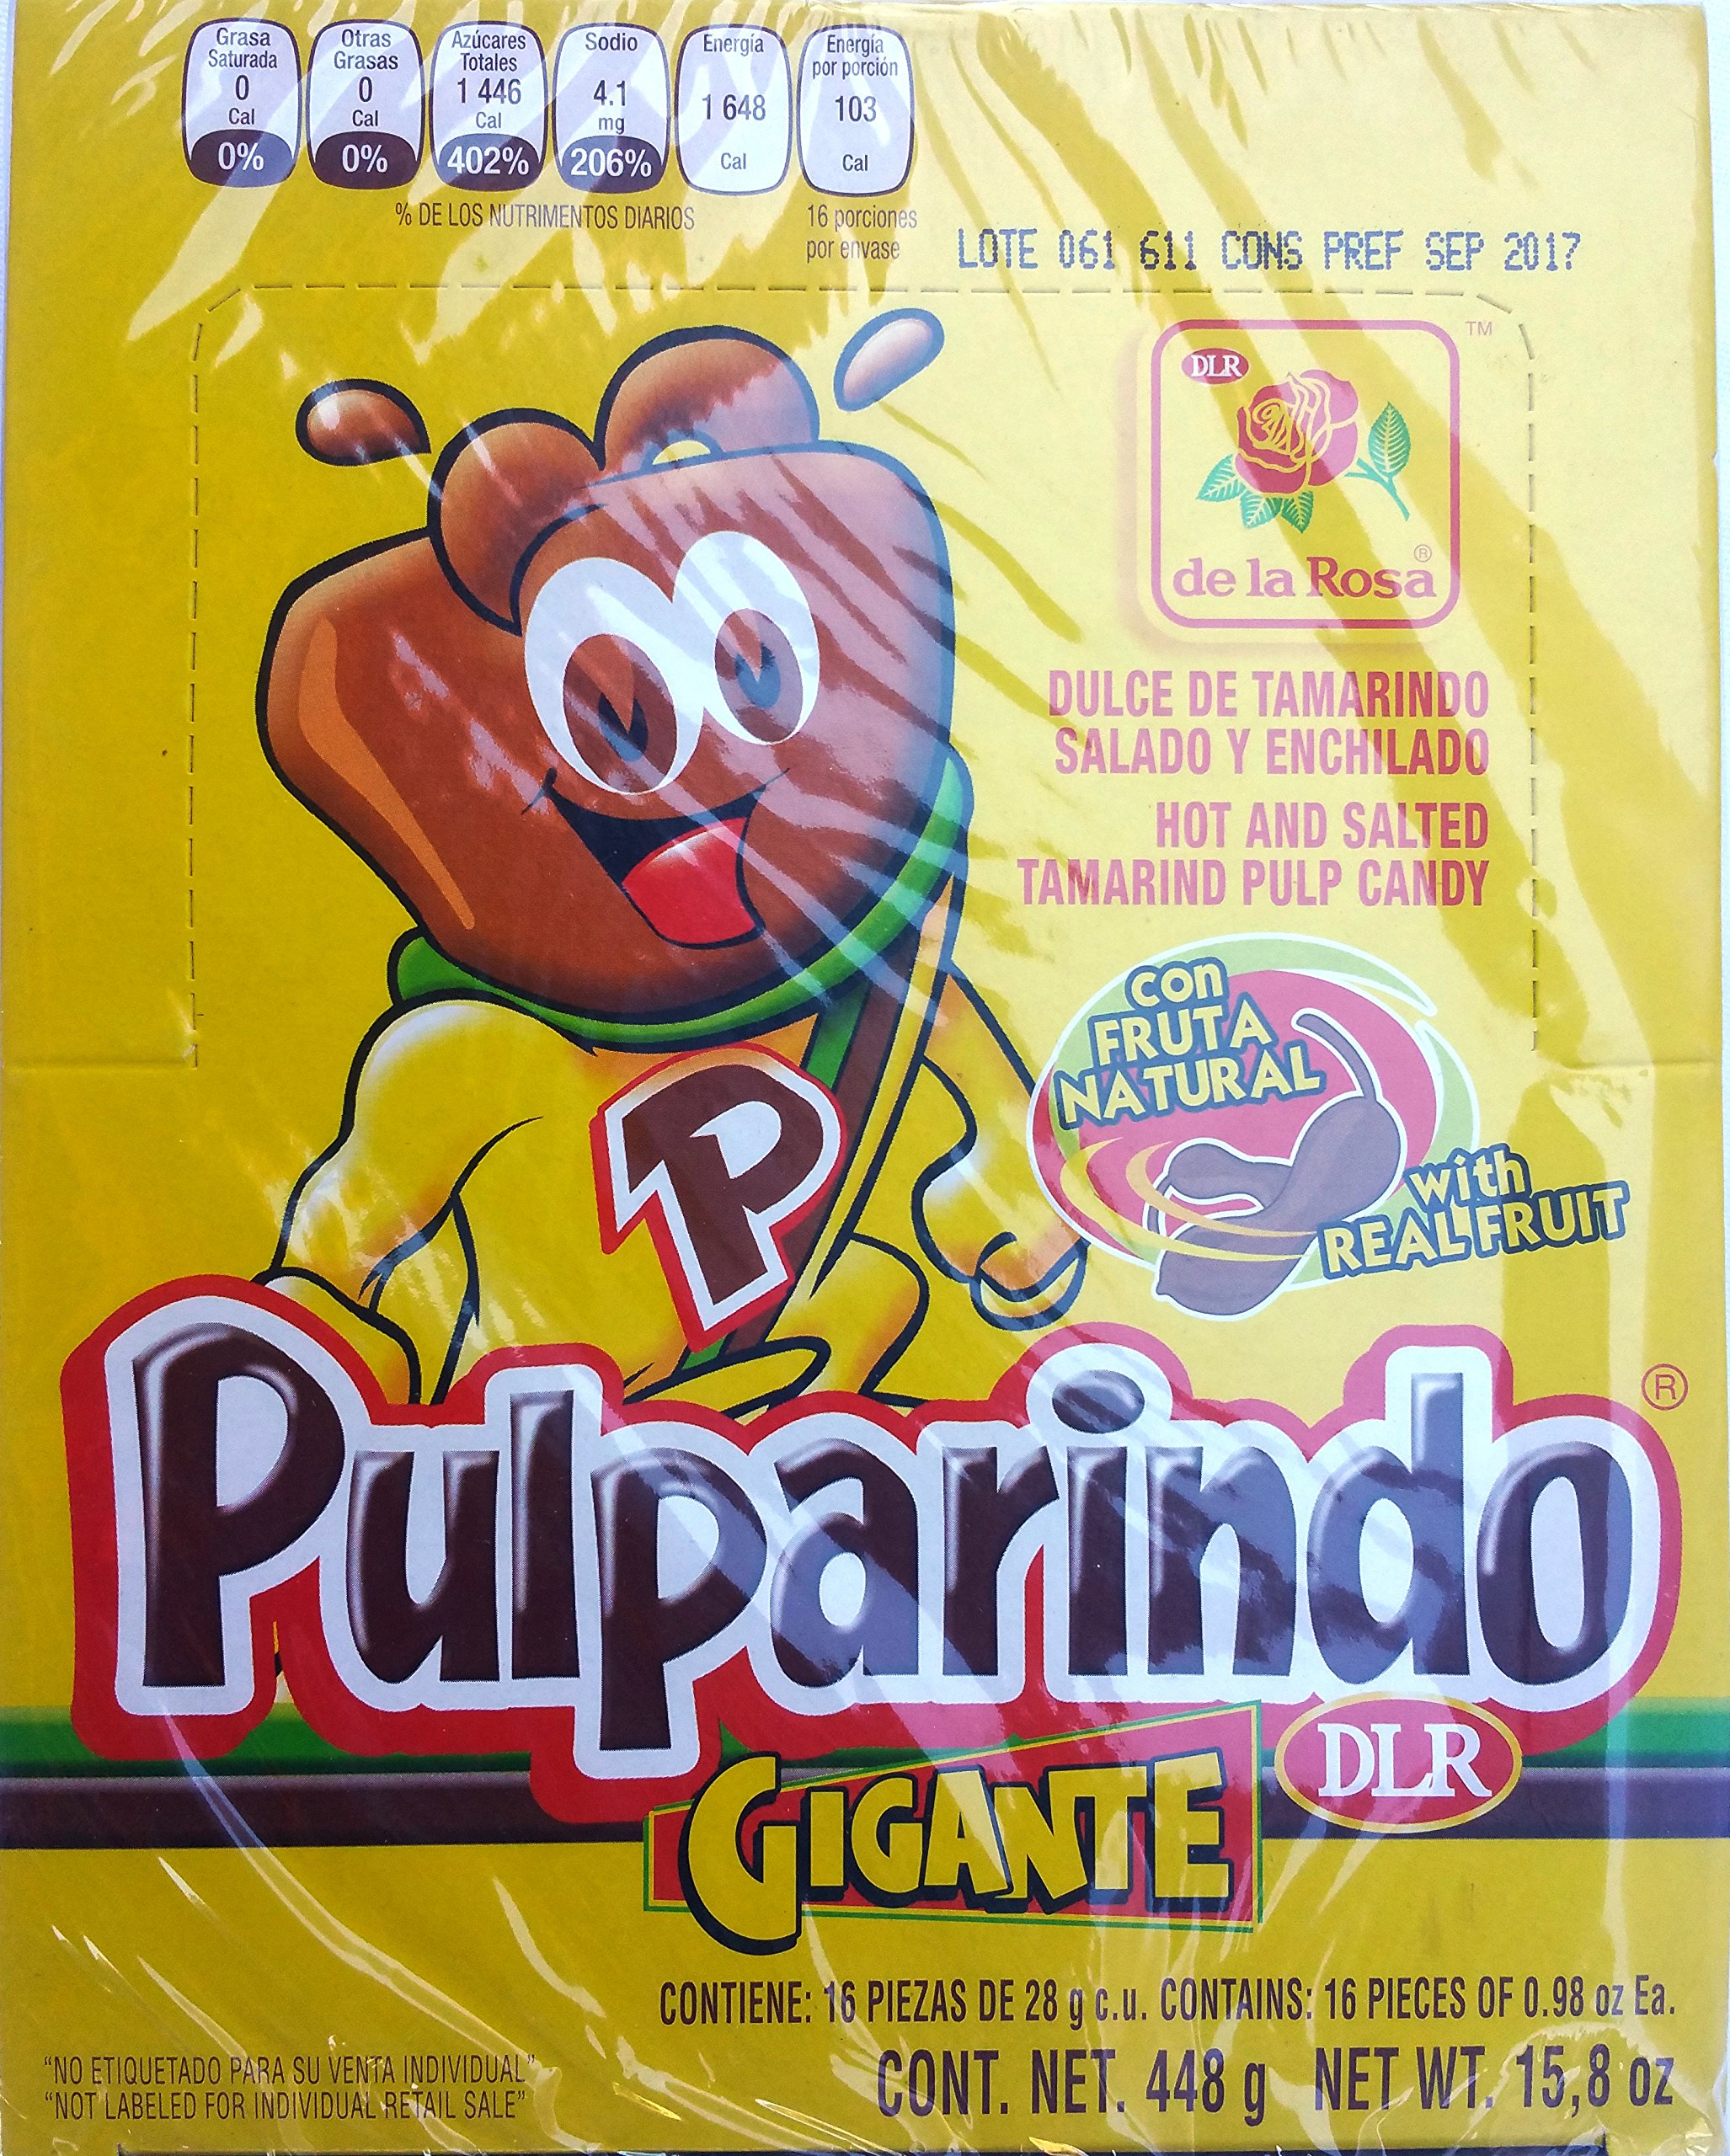 Pulparindo Gigante (Extra Large), 16 pack 0.98 oz each